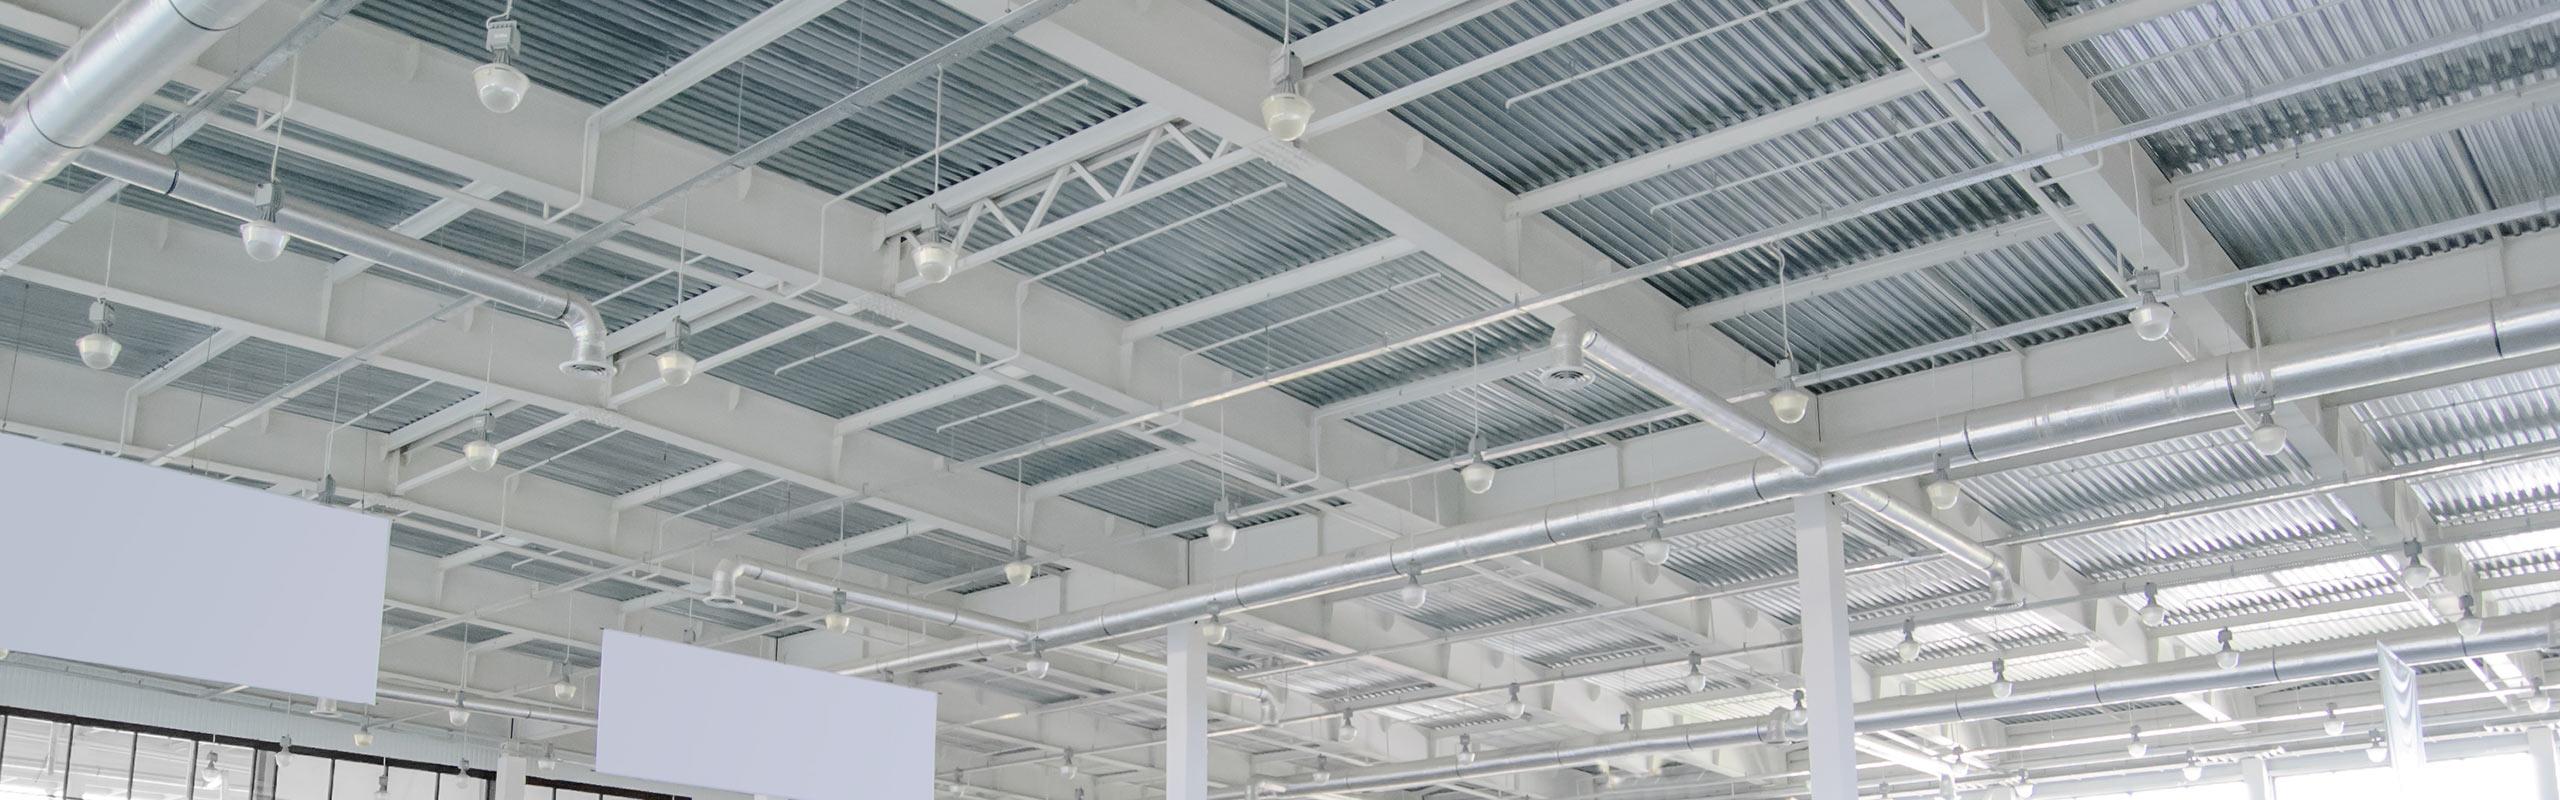 warehouse lighting solutions